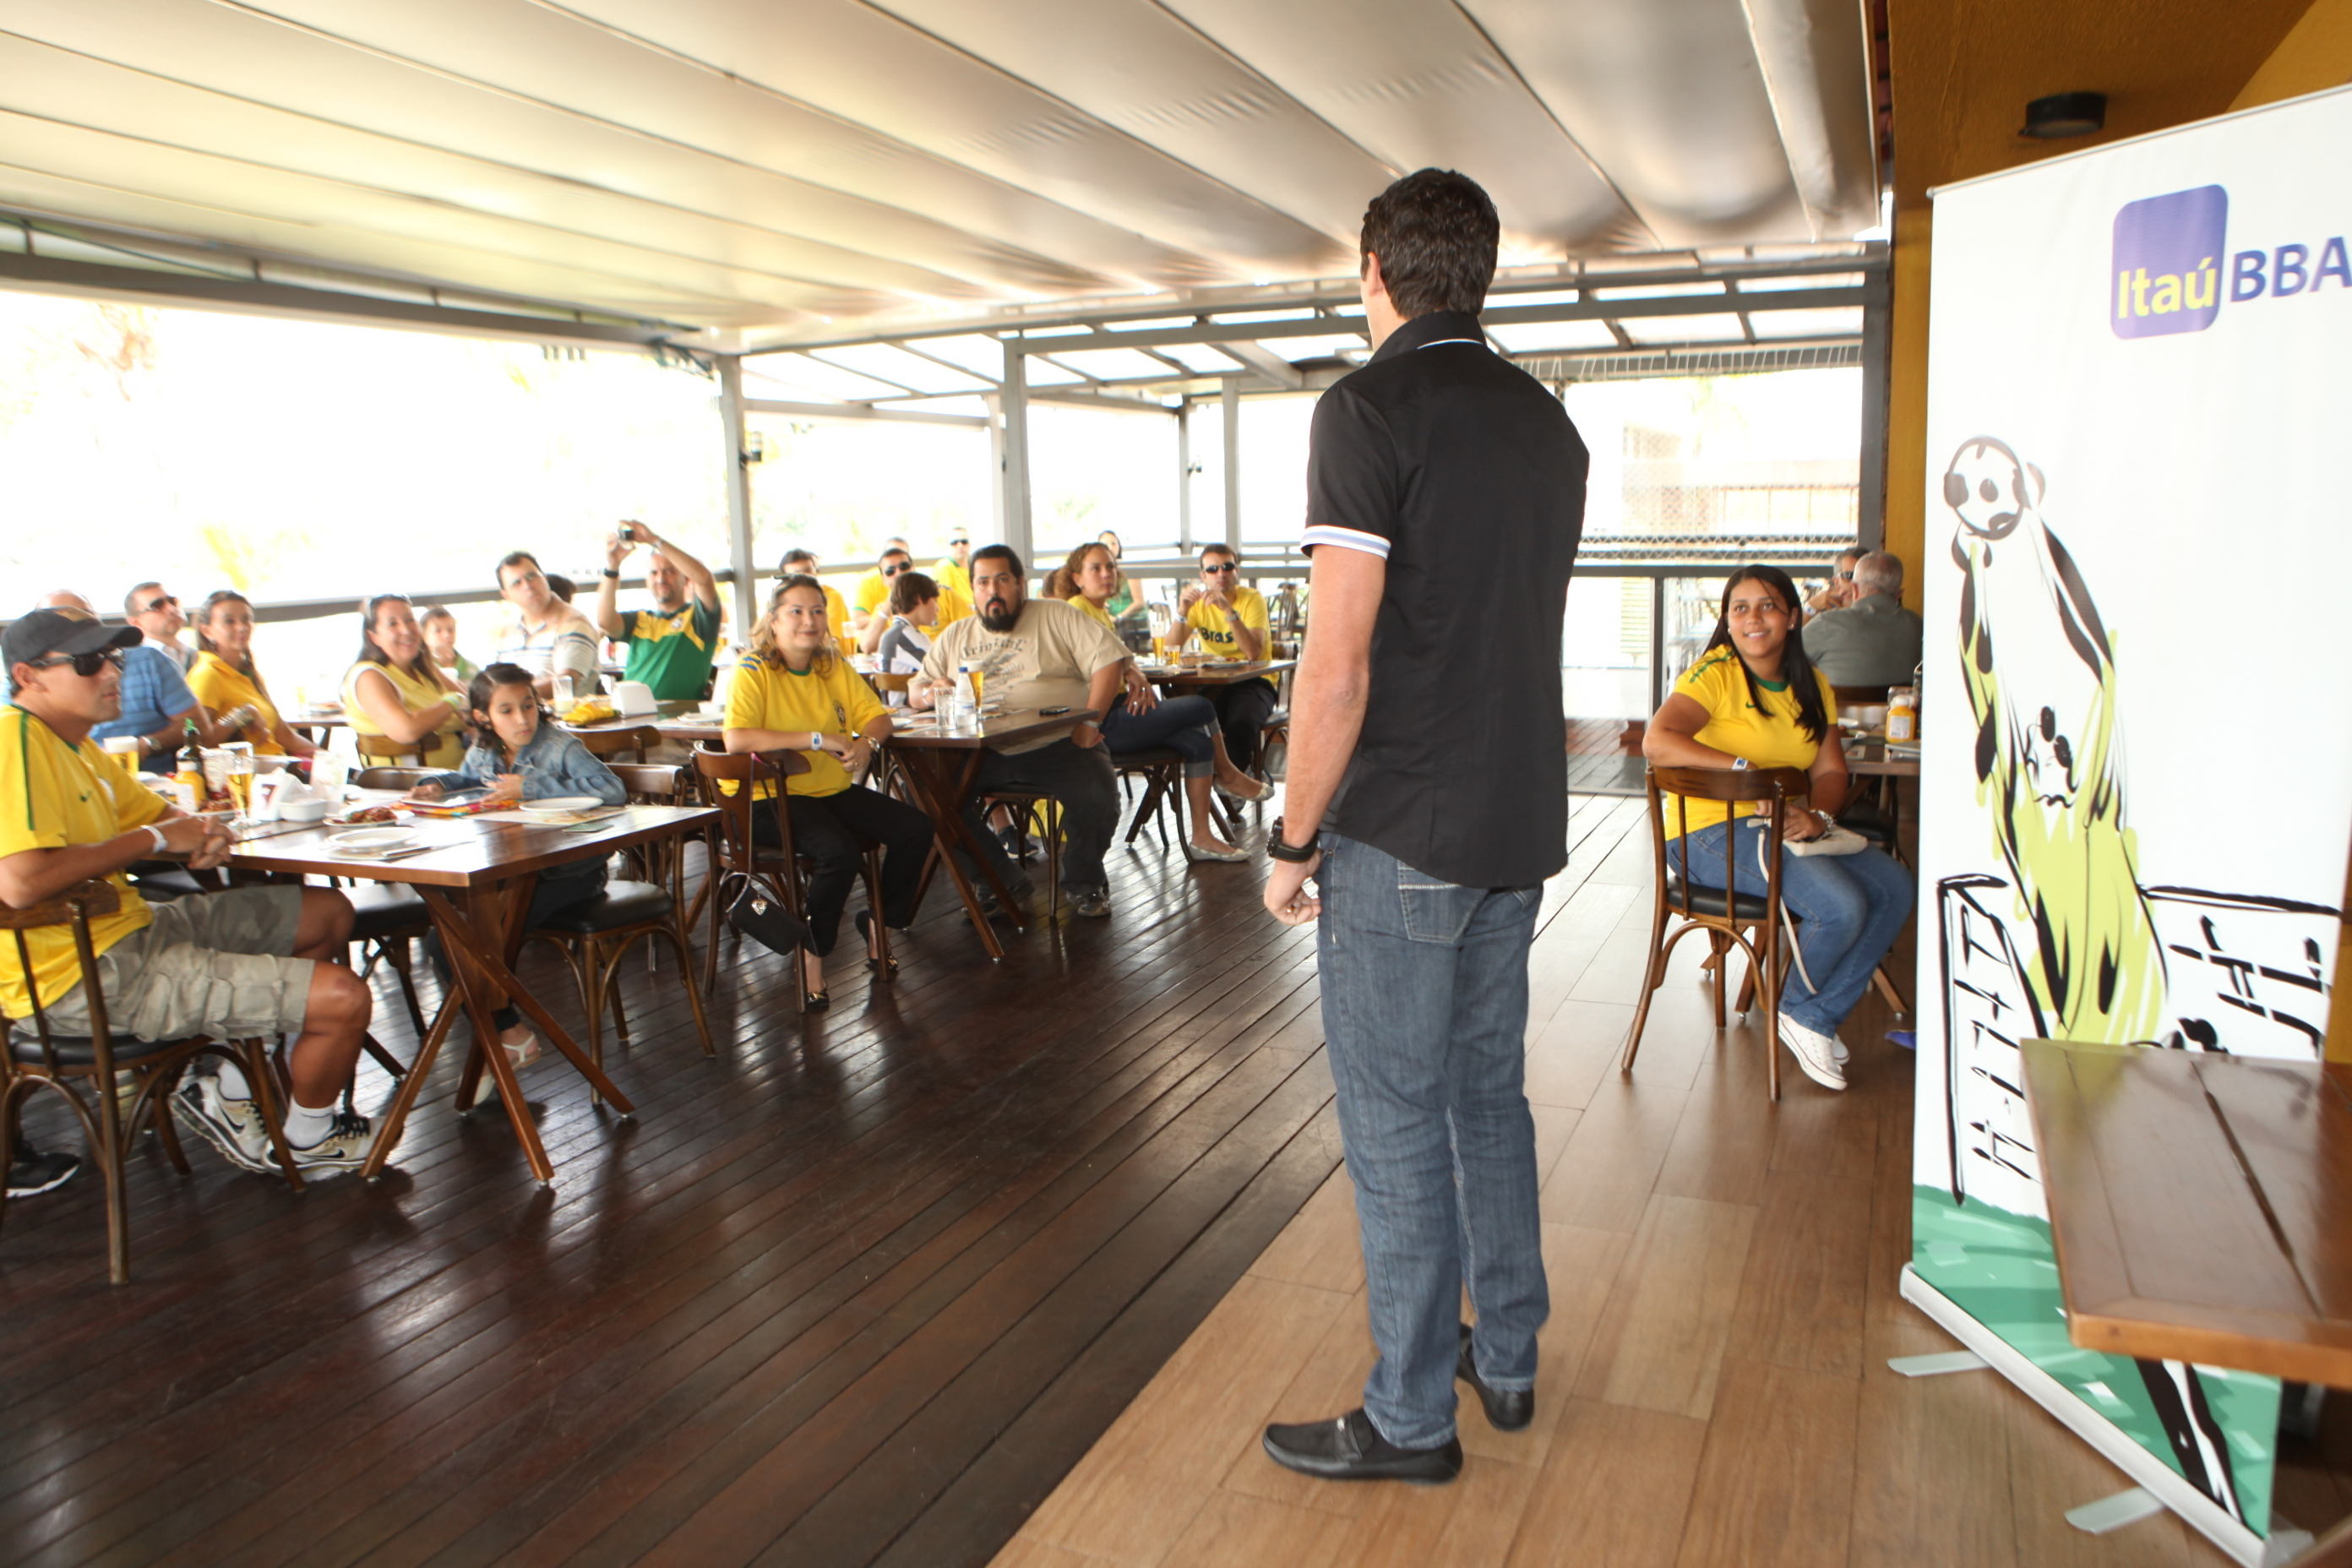 Itaú_BBA_-_Brasil_x_Austrália_-_07092013_79